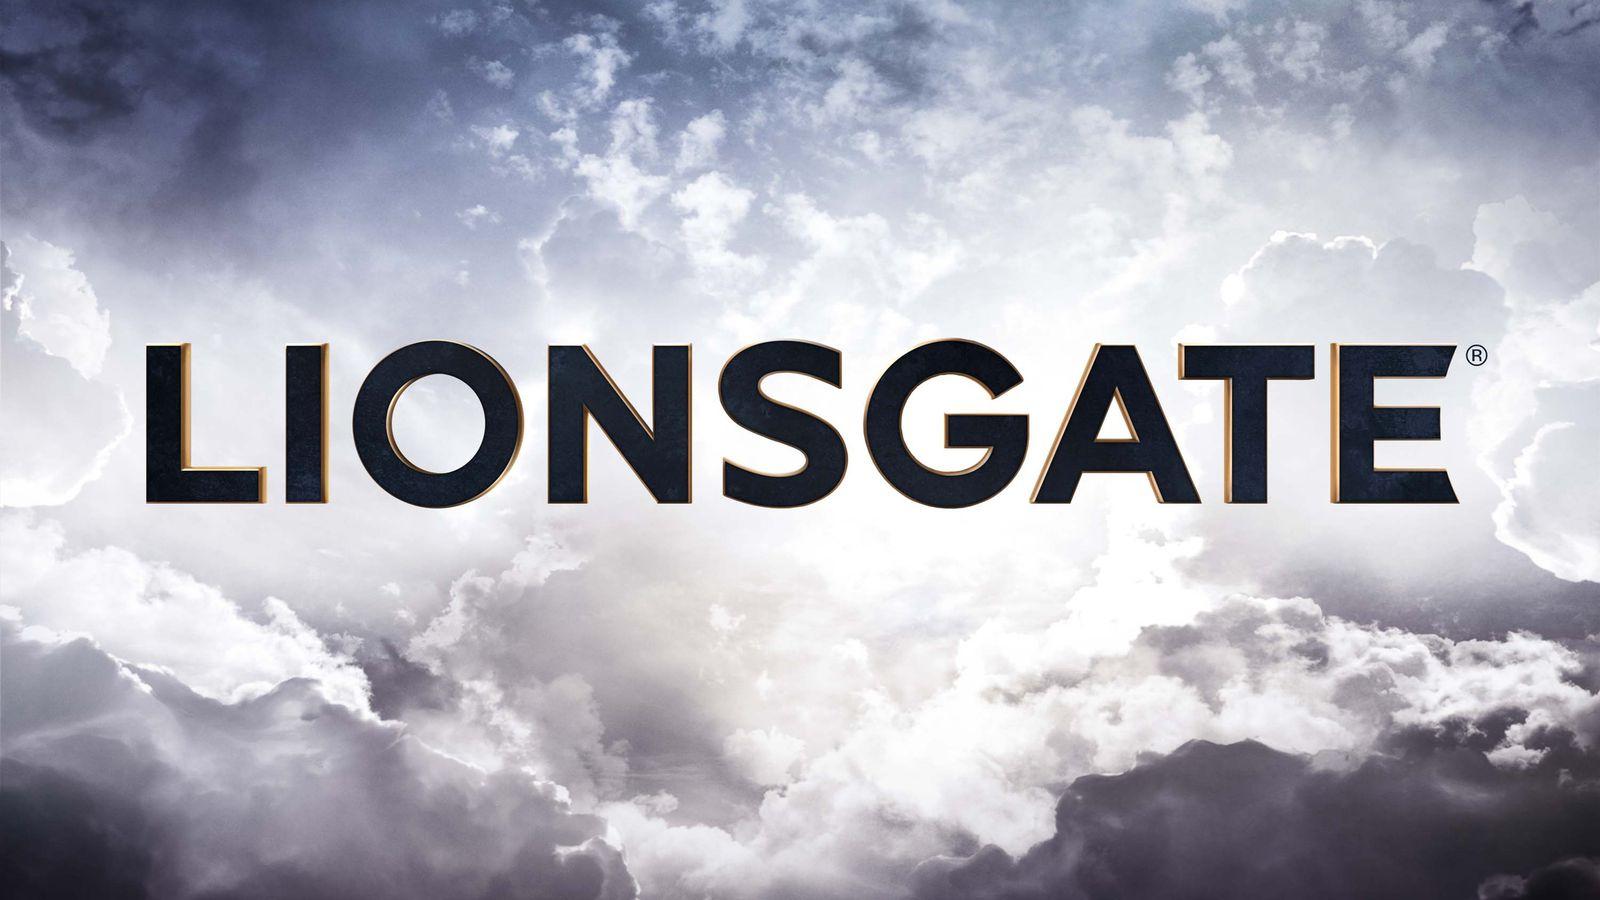 Lionsgate-logo1.0.jpg